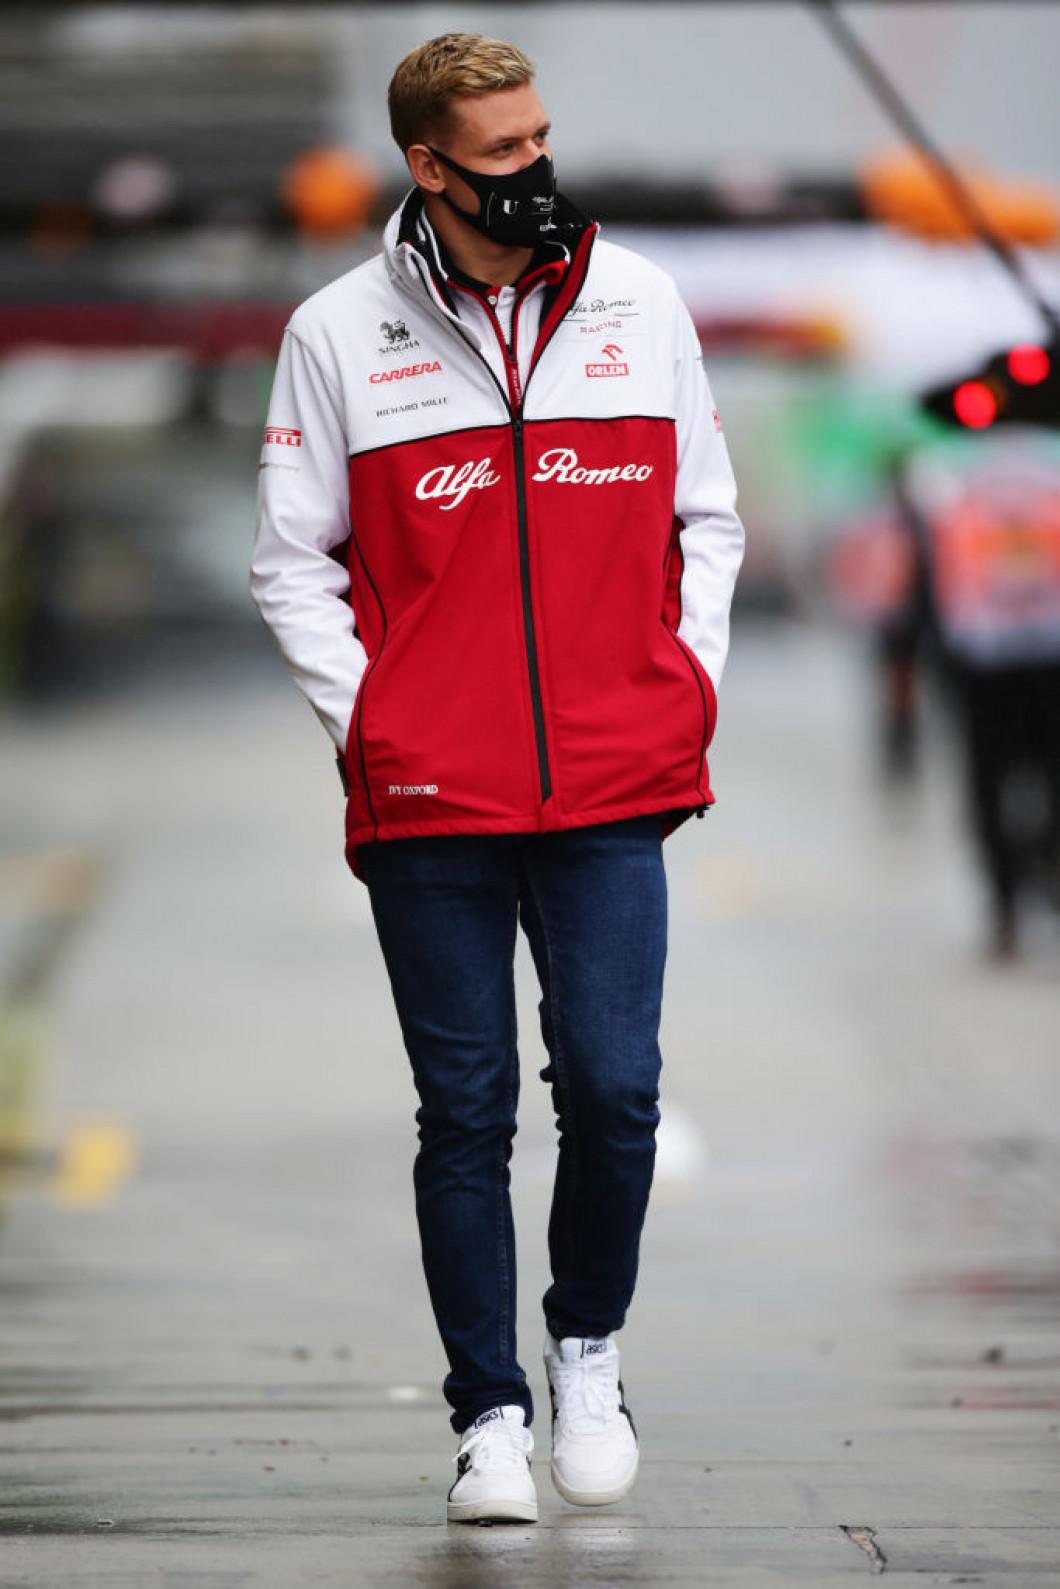 F1 Eifel Grand Prix - Practice